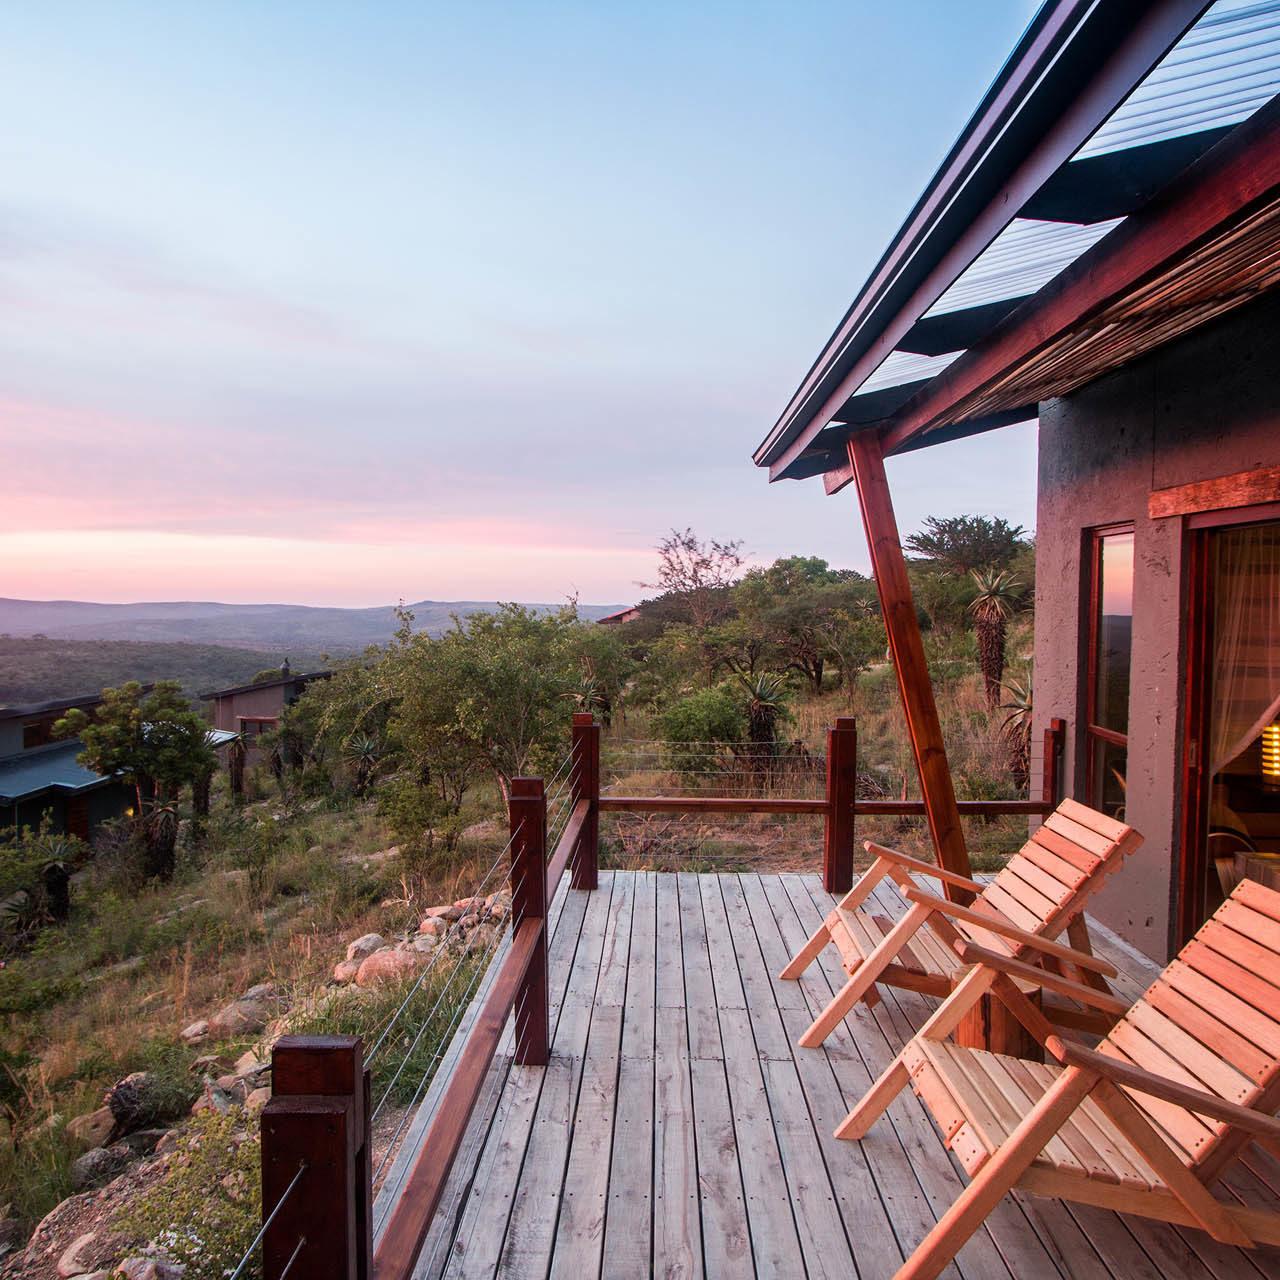 Rhino Ridge Safari Lodge (Umfolozi game Reserve)